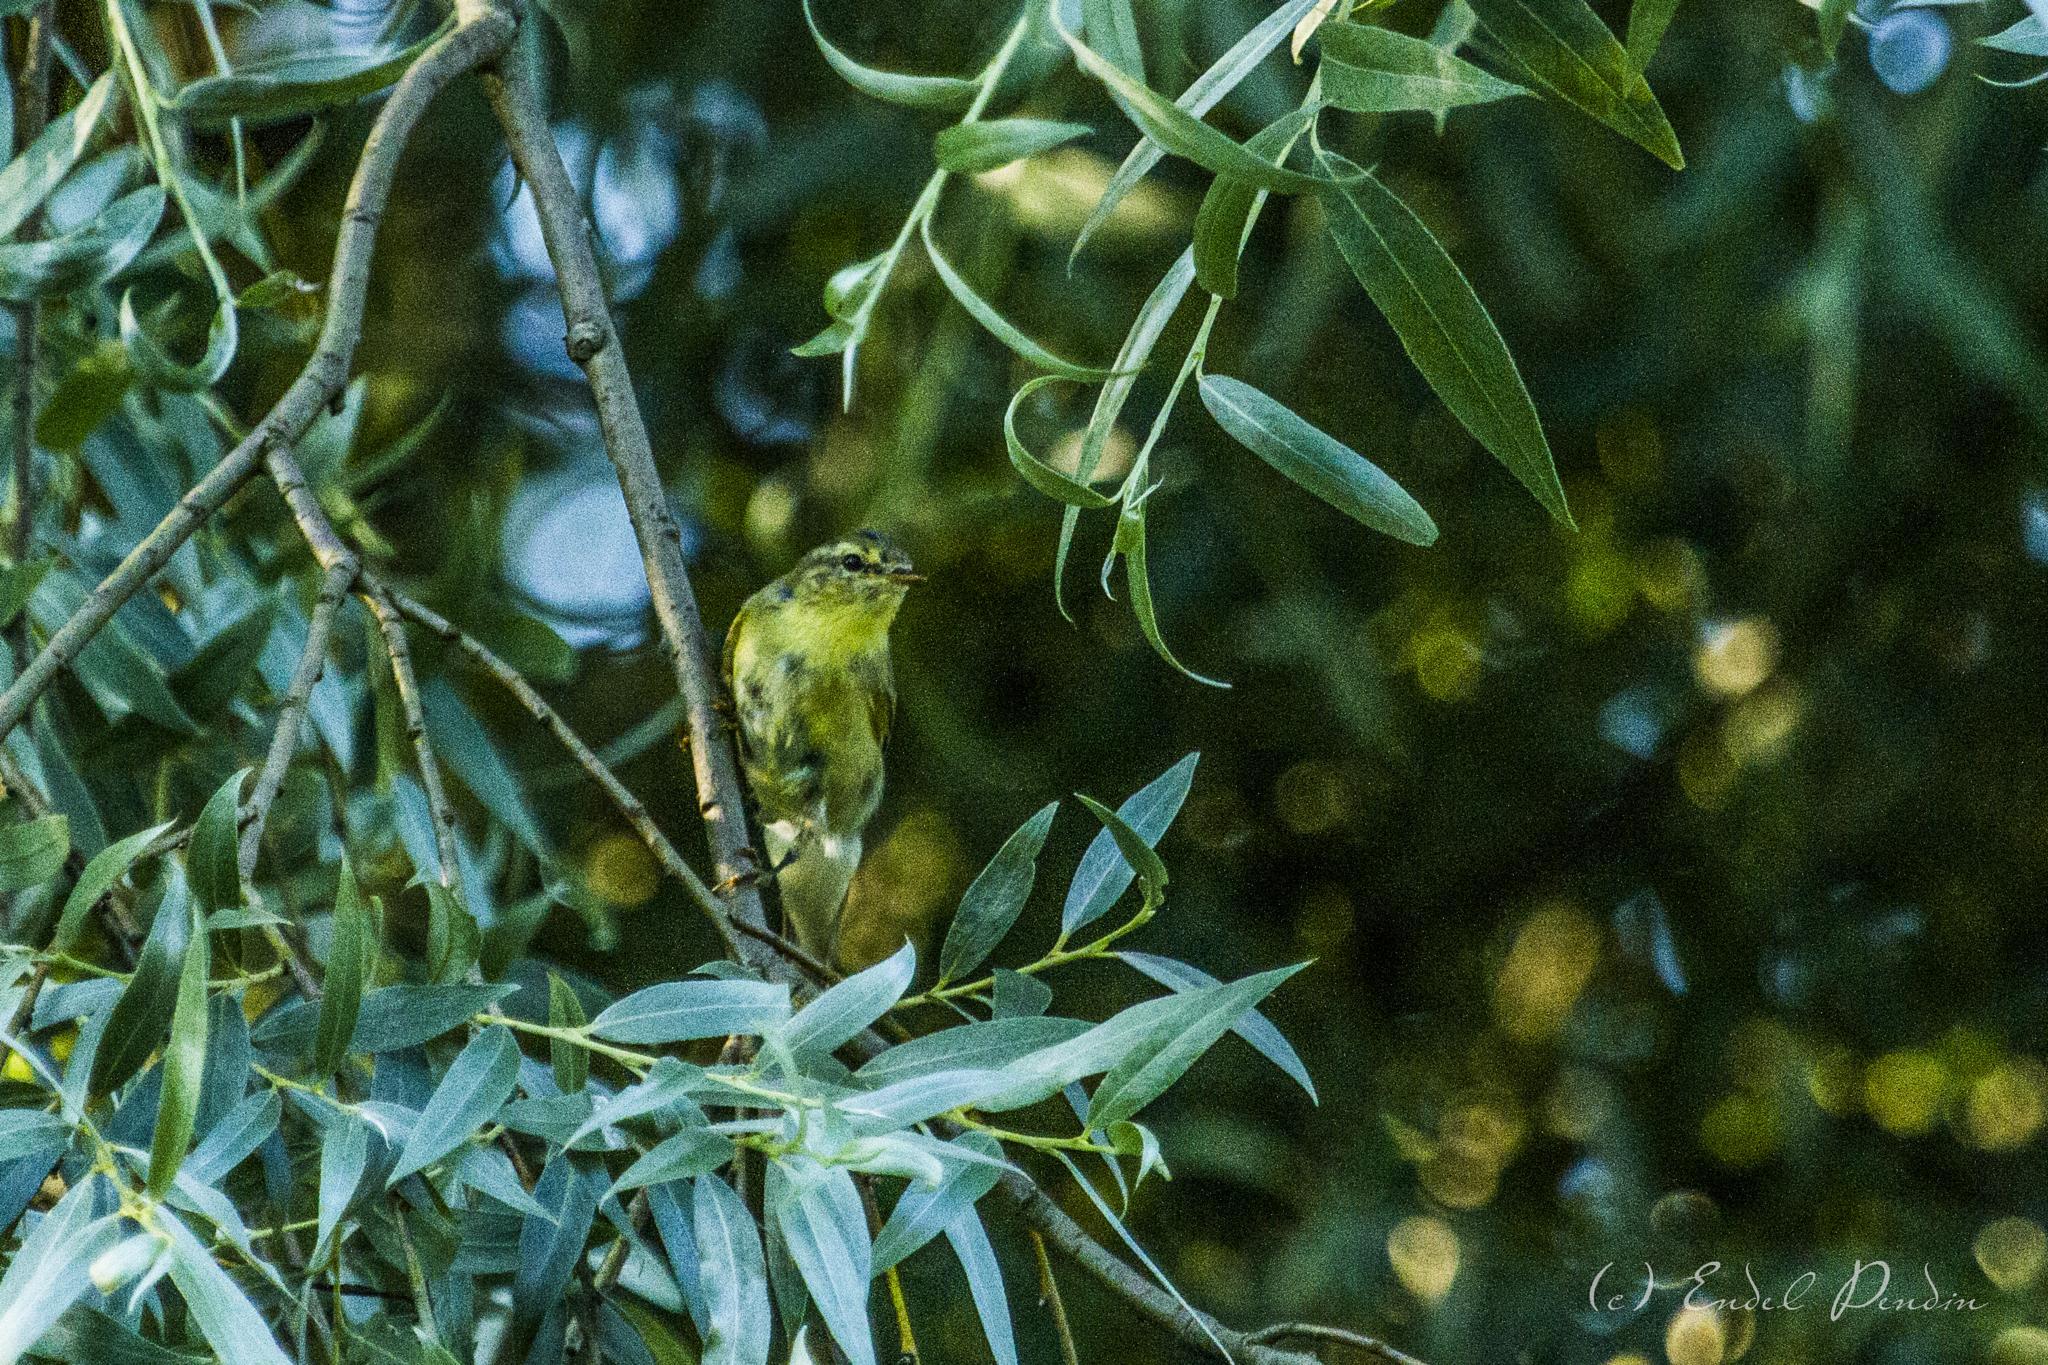 The common chiffchaff (Phylloscopus collybita). by sarvikpytt